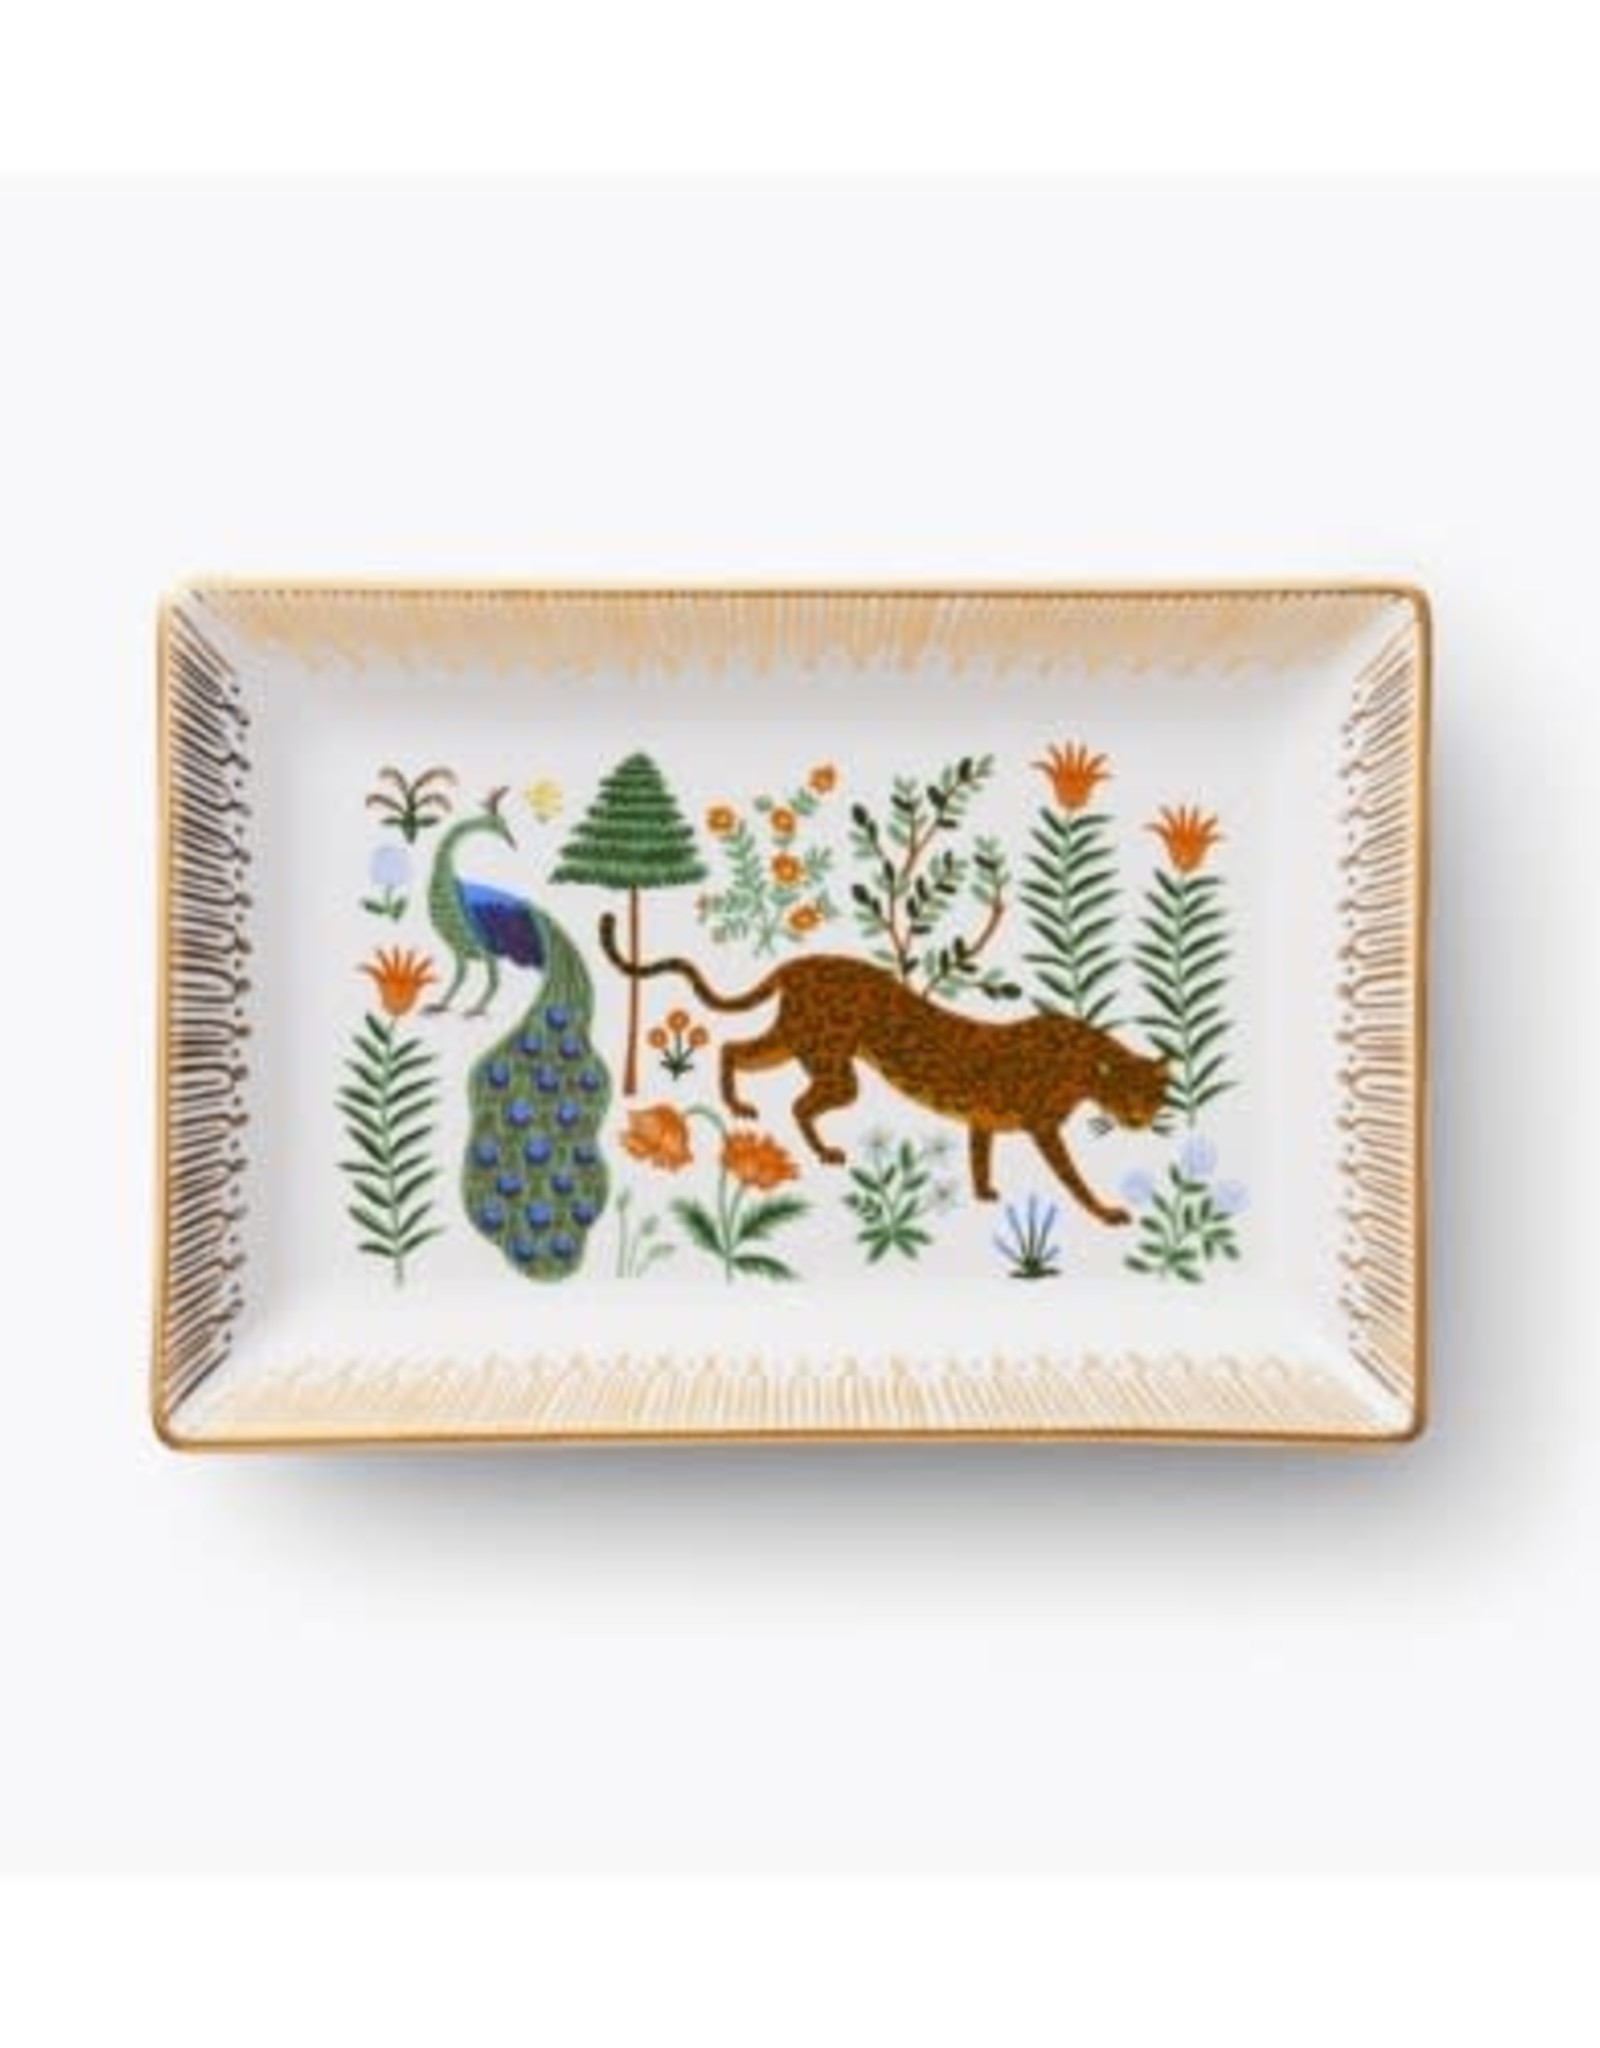 Riffle Paper Co. Catchall Tray - Jungle